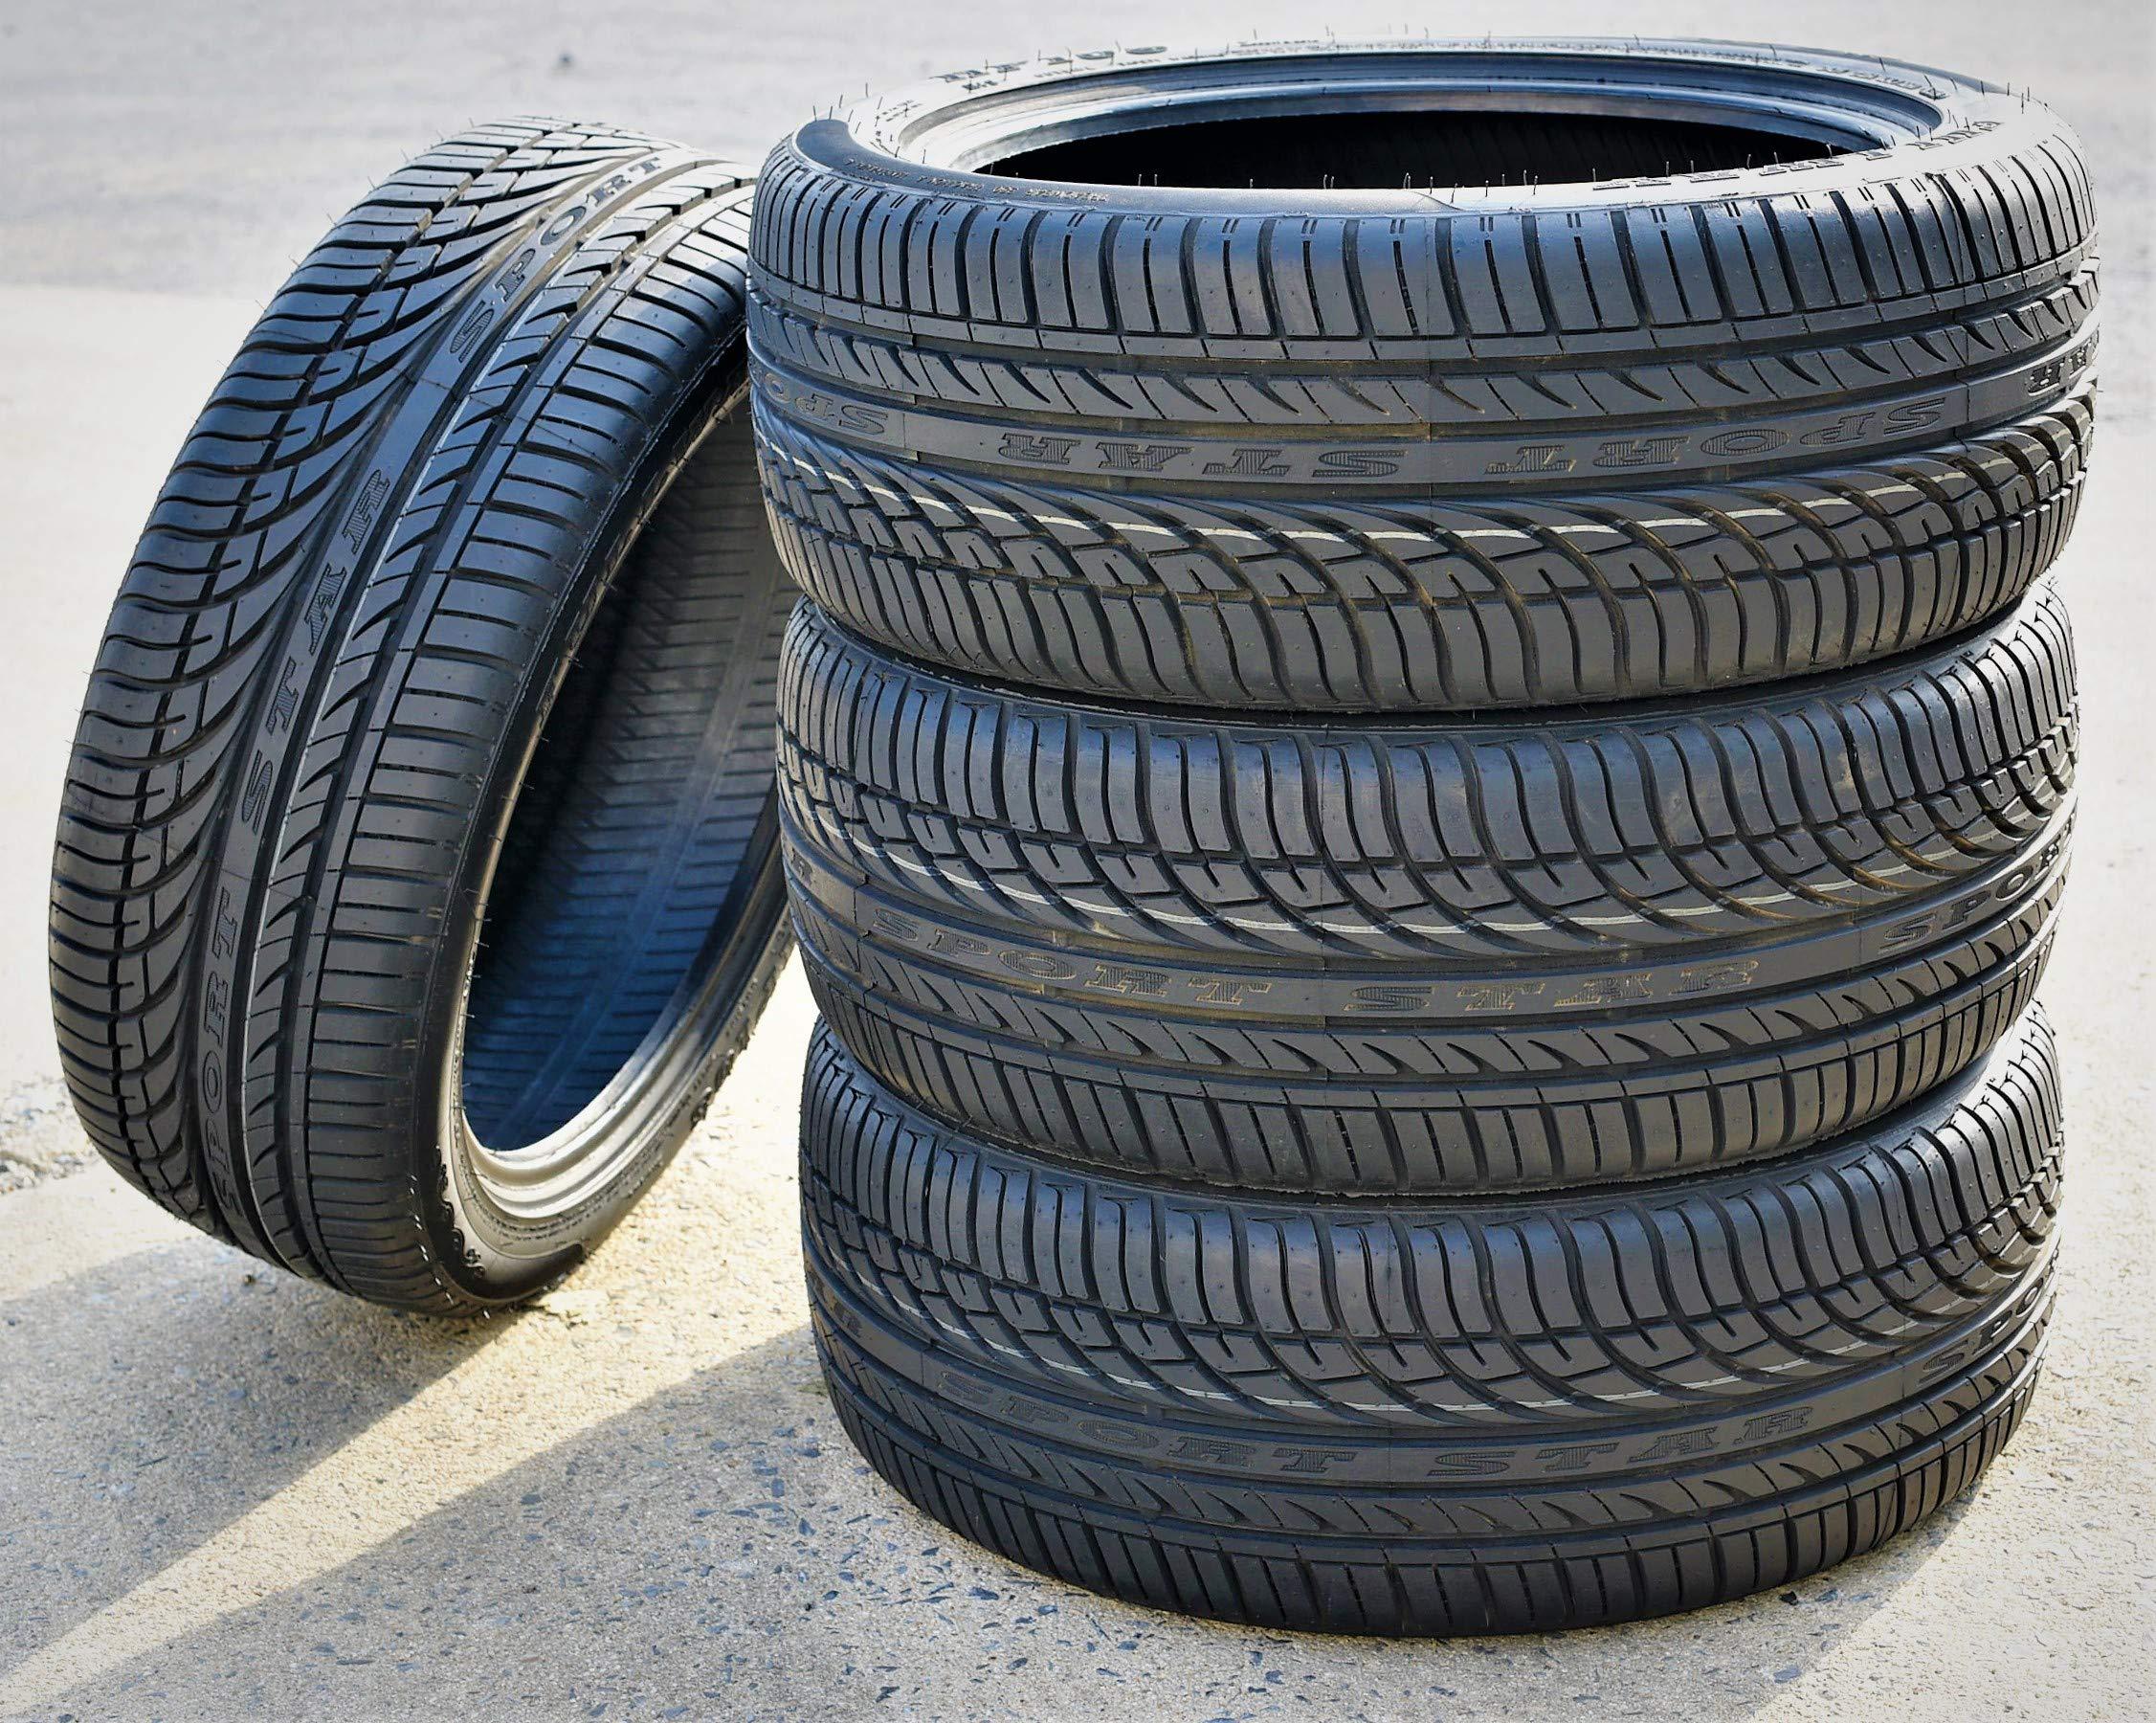 Set of 4 (FOUR) Fullway HP108 All-Season High Performance Radial Tires-225/45ZR17 94W XL